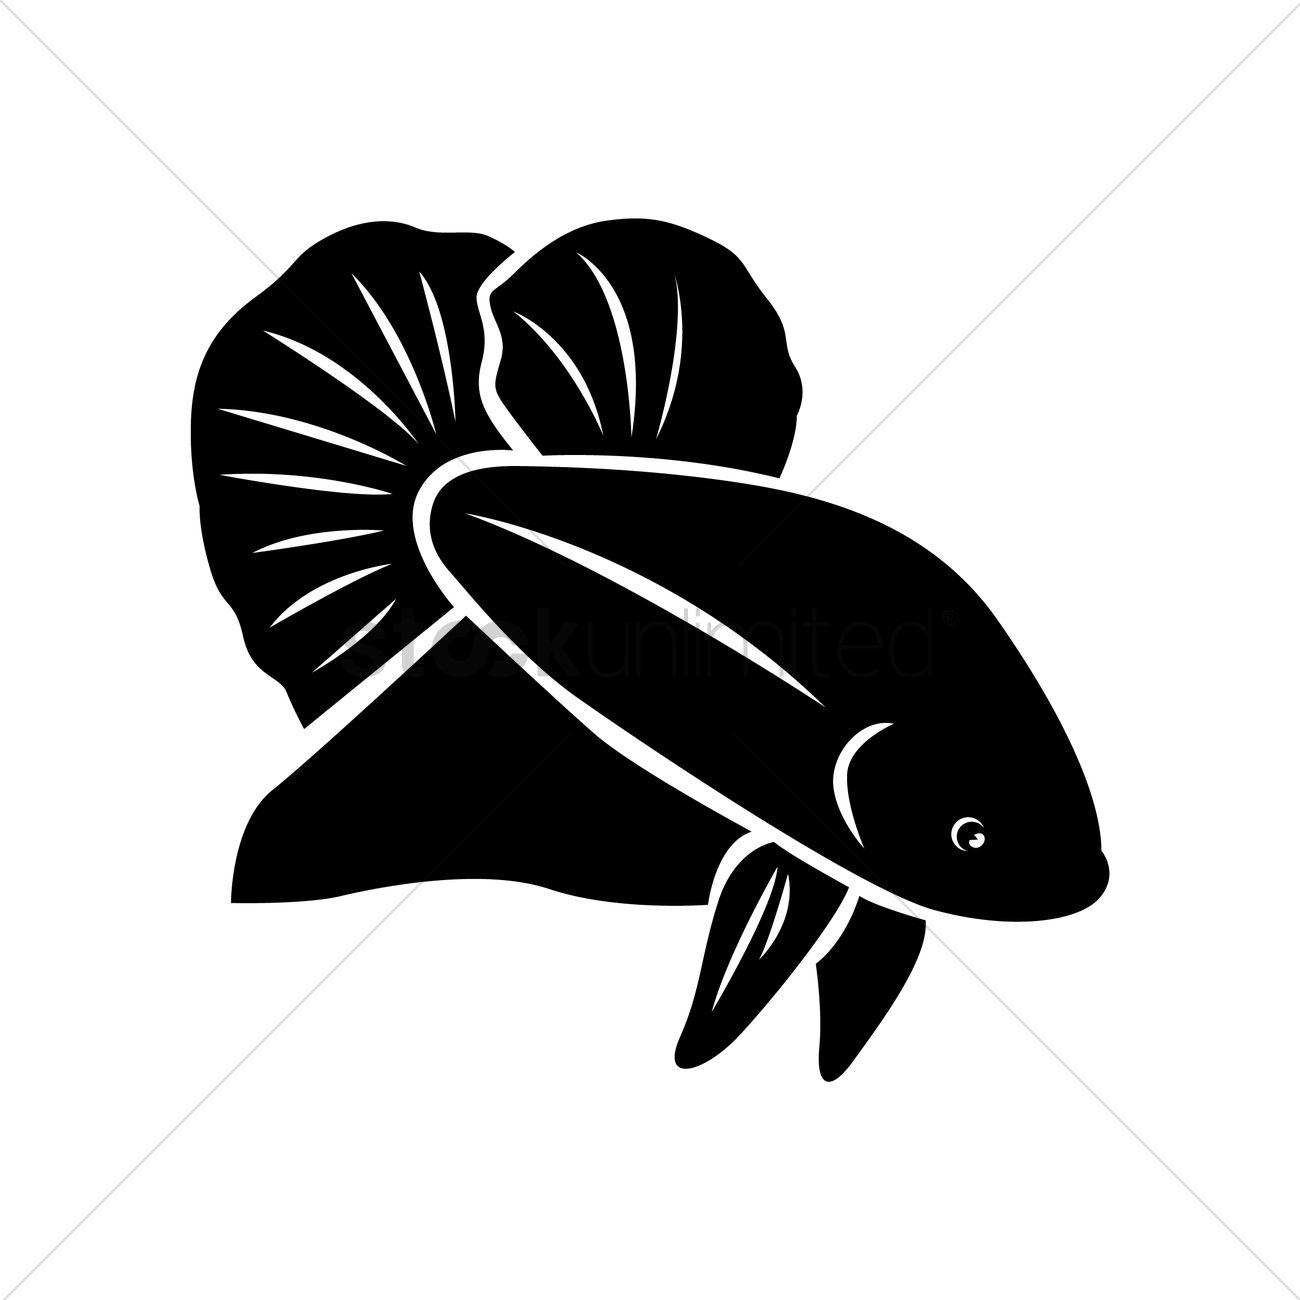 Betta fish Vector Image - 1537500   StockUnlimited (1300 x 1300 Pixel)